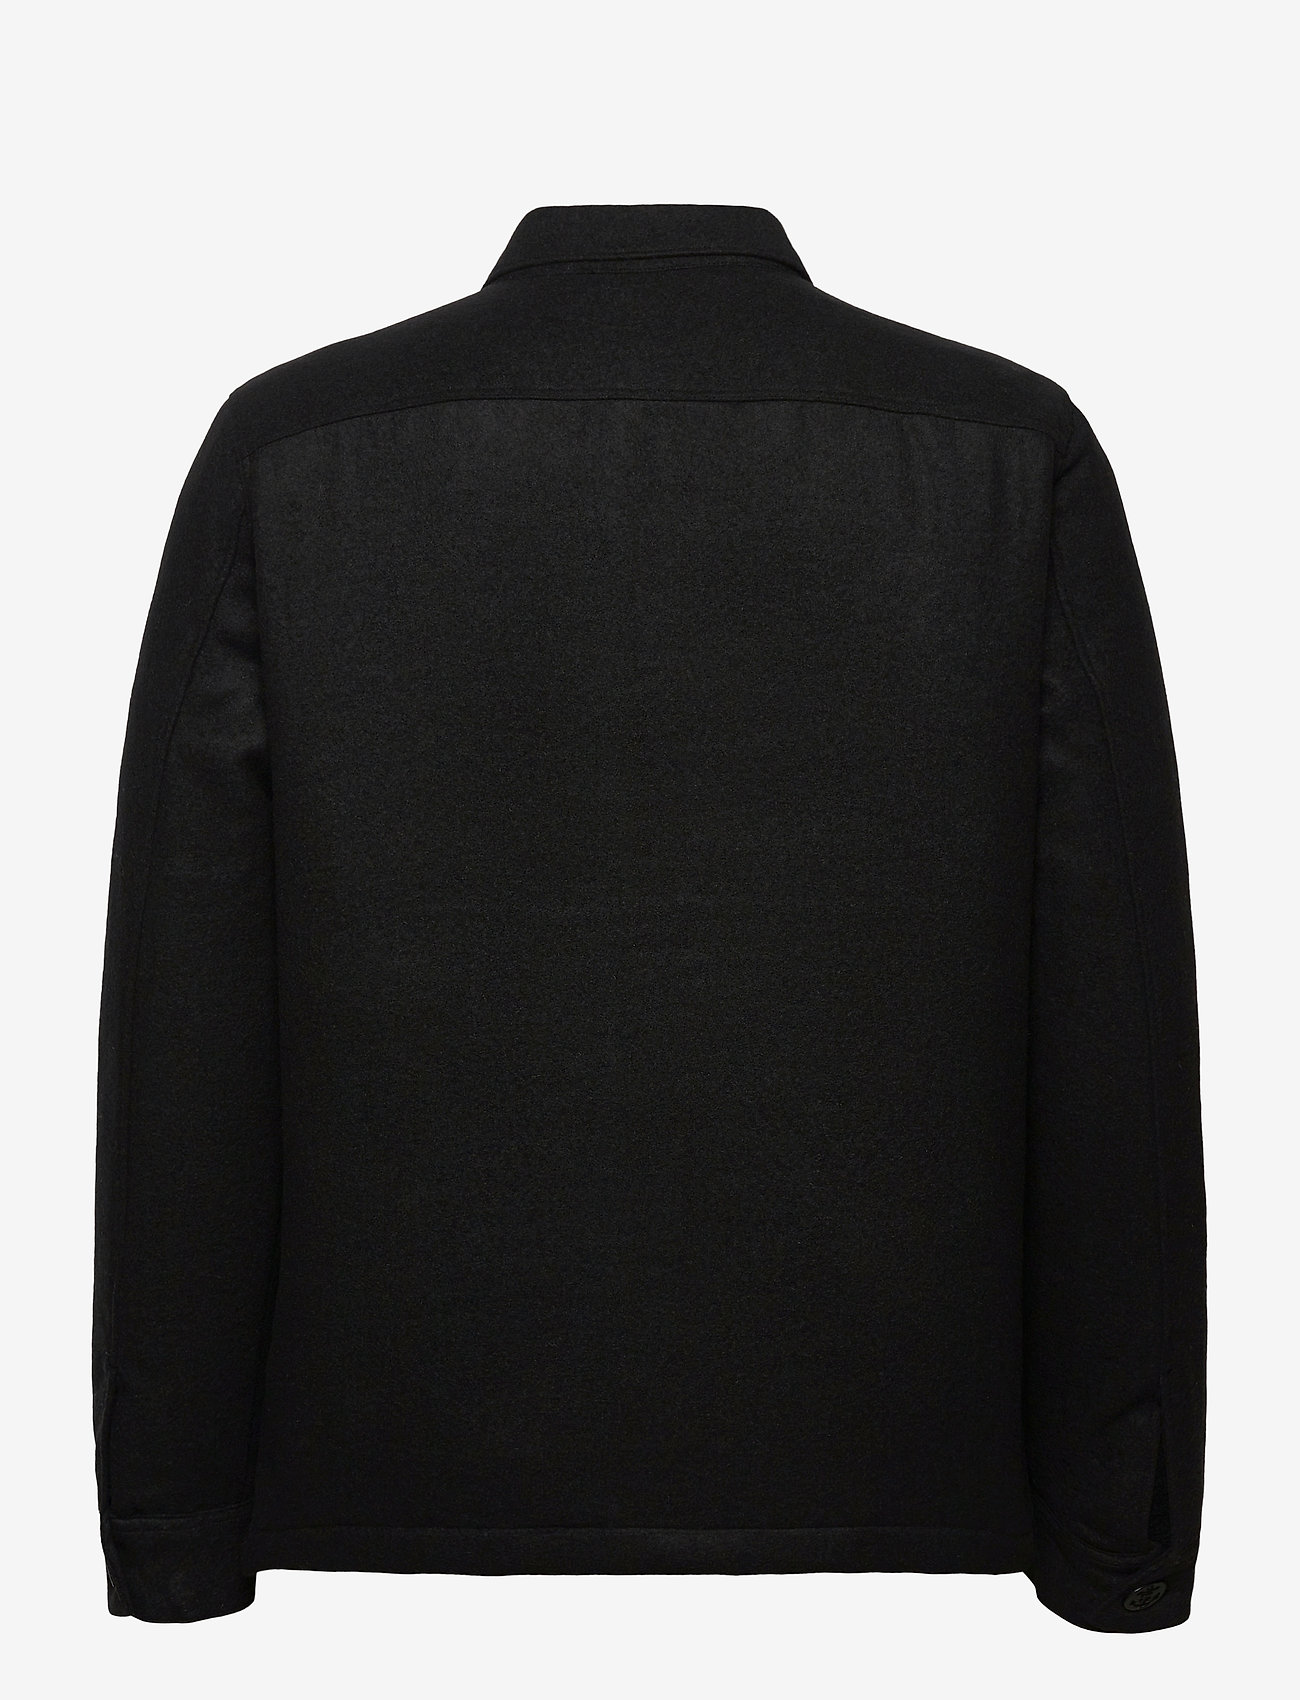 AllSaints - POTOMAC LS SHIRT - vêtements - jet black - 1